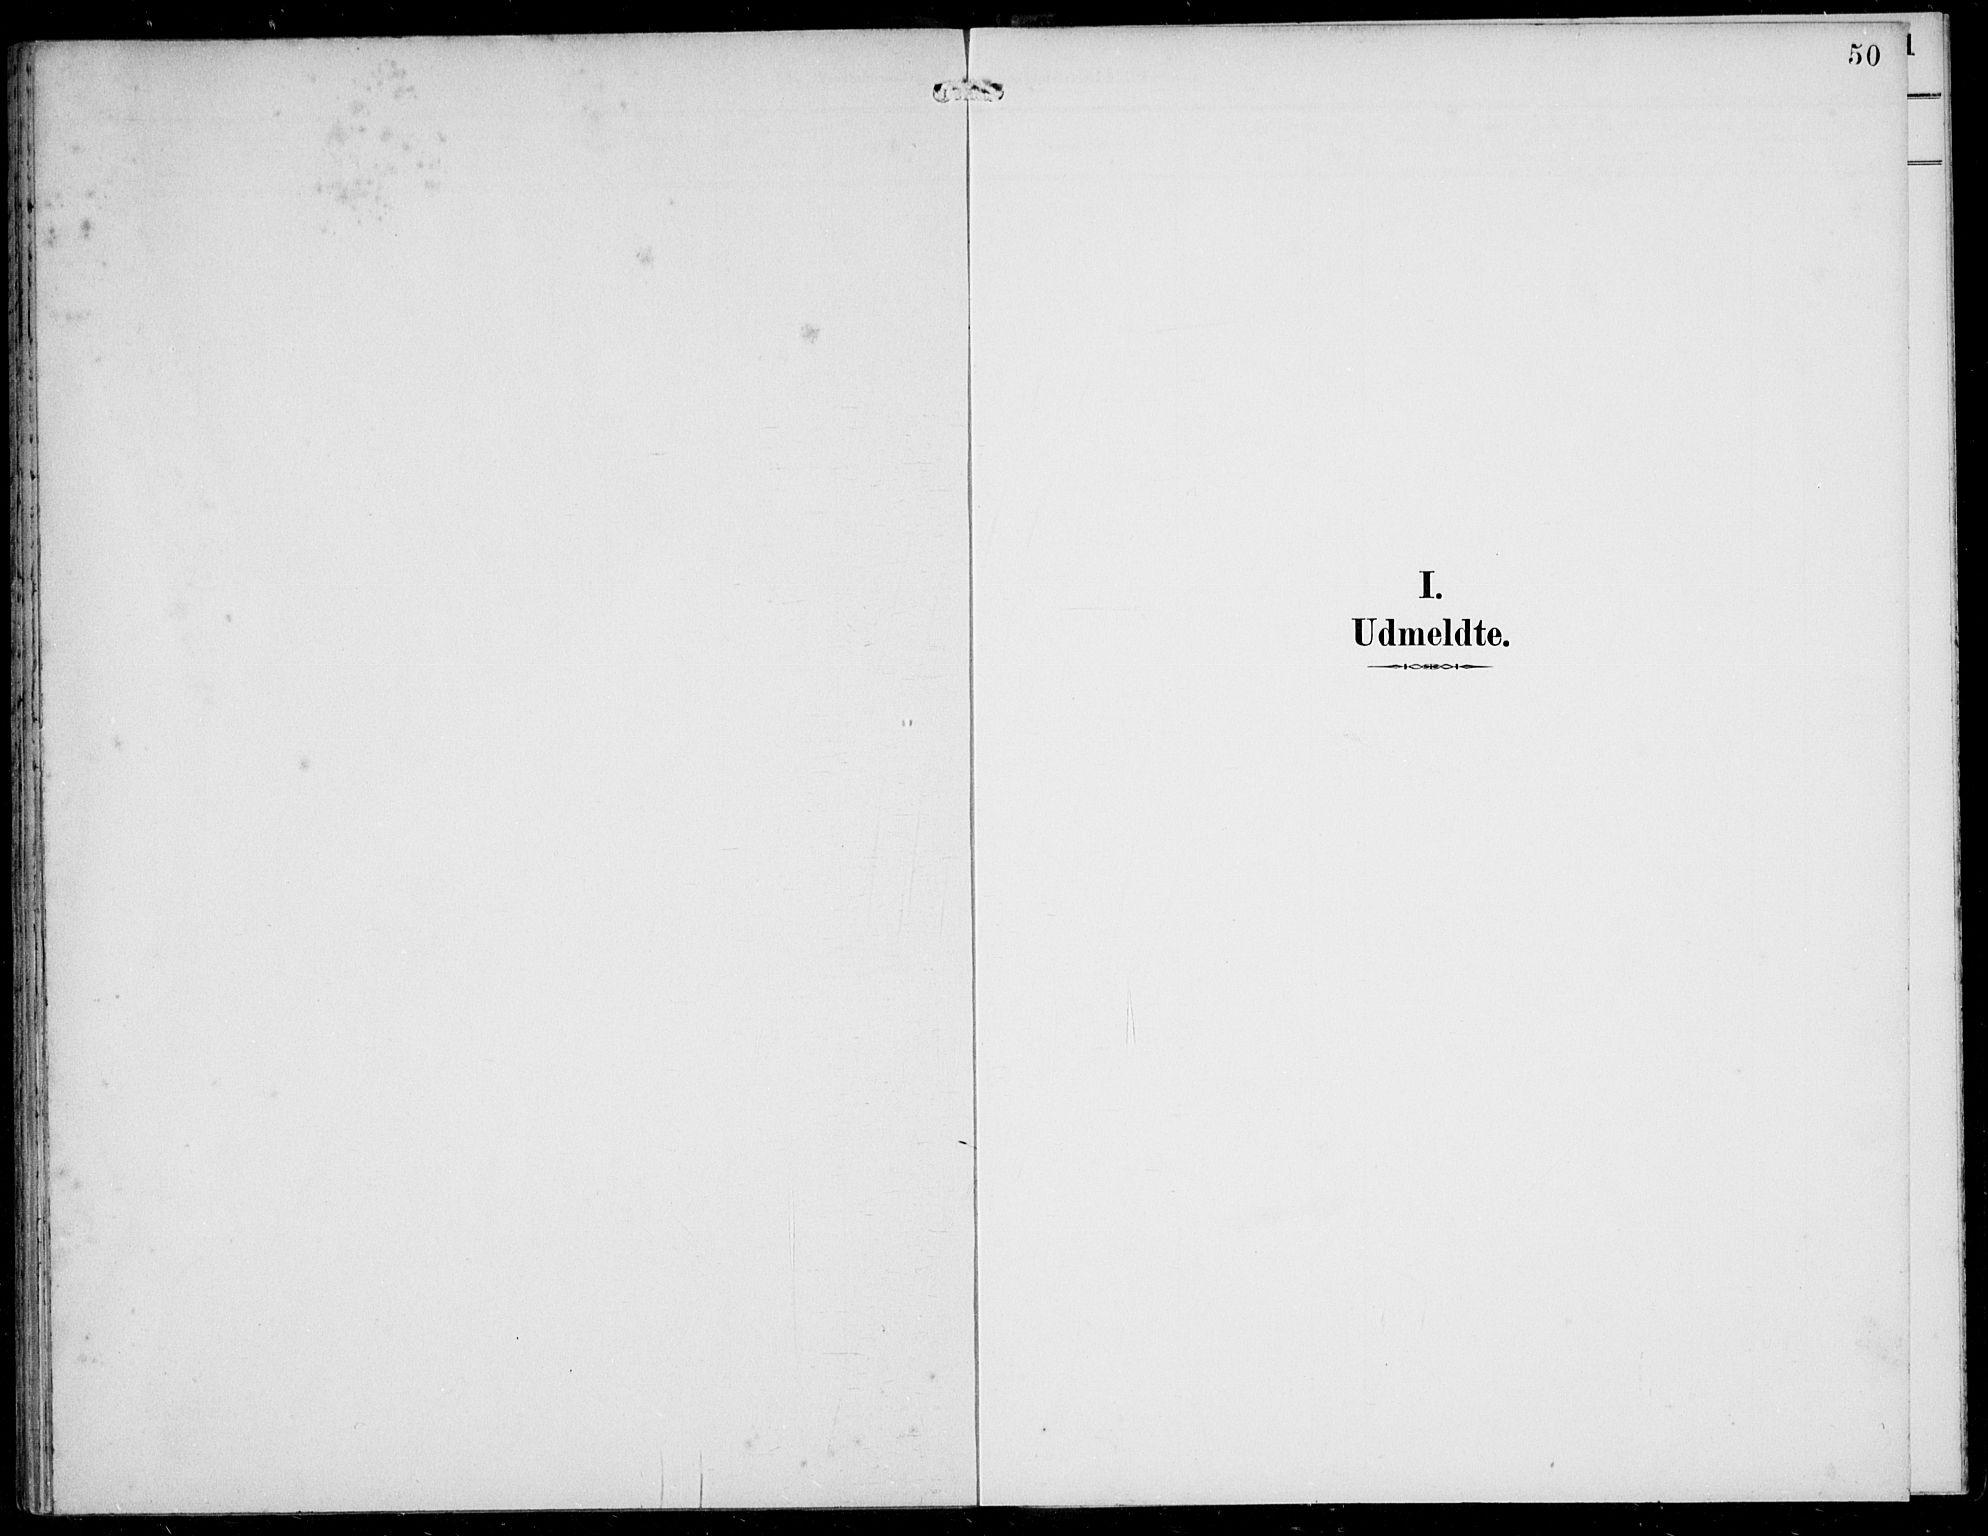 SAB, Solund sokneprestembete, Ministerialbok nr. B  1, 1891-1901, s. 50